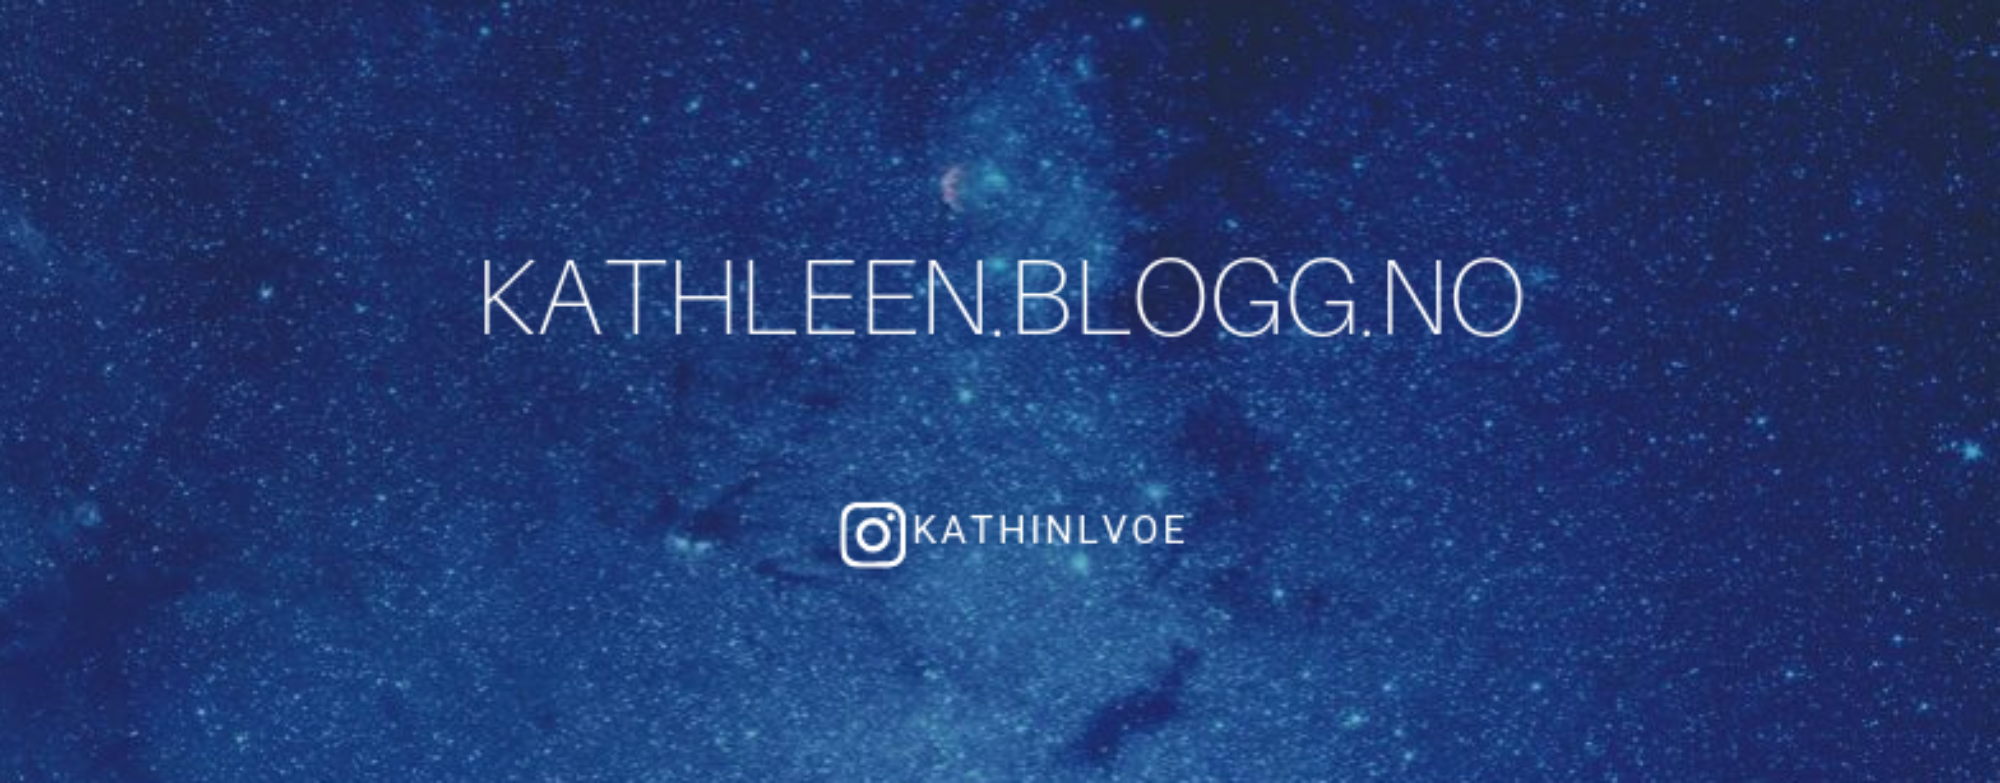 Kathleen.blogg.no